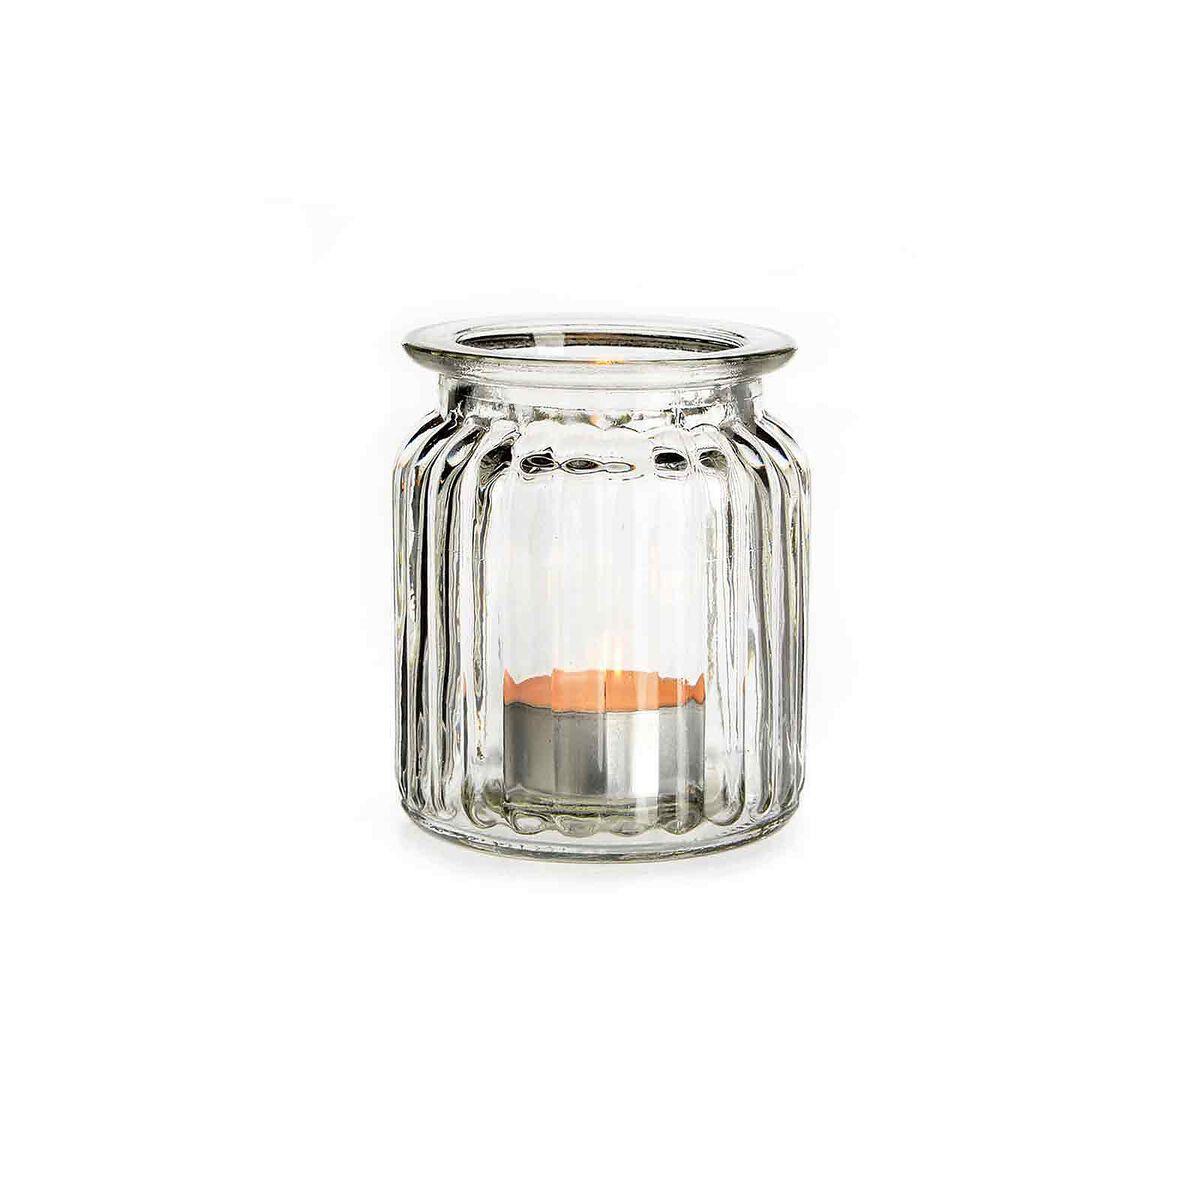 windlicht gerillt aus glas ca d 7cm x h 9cm klar depot de. Black Bedroom Furniture Sets. Home Design Ideas